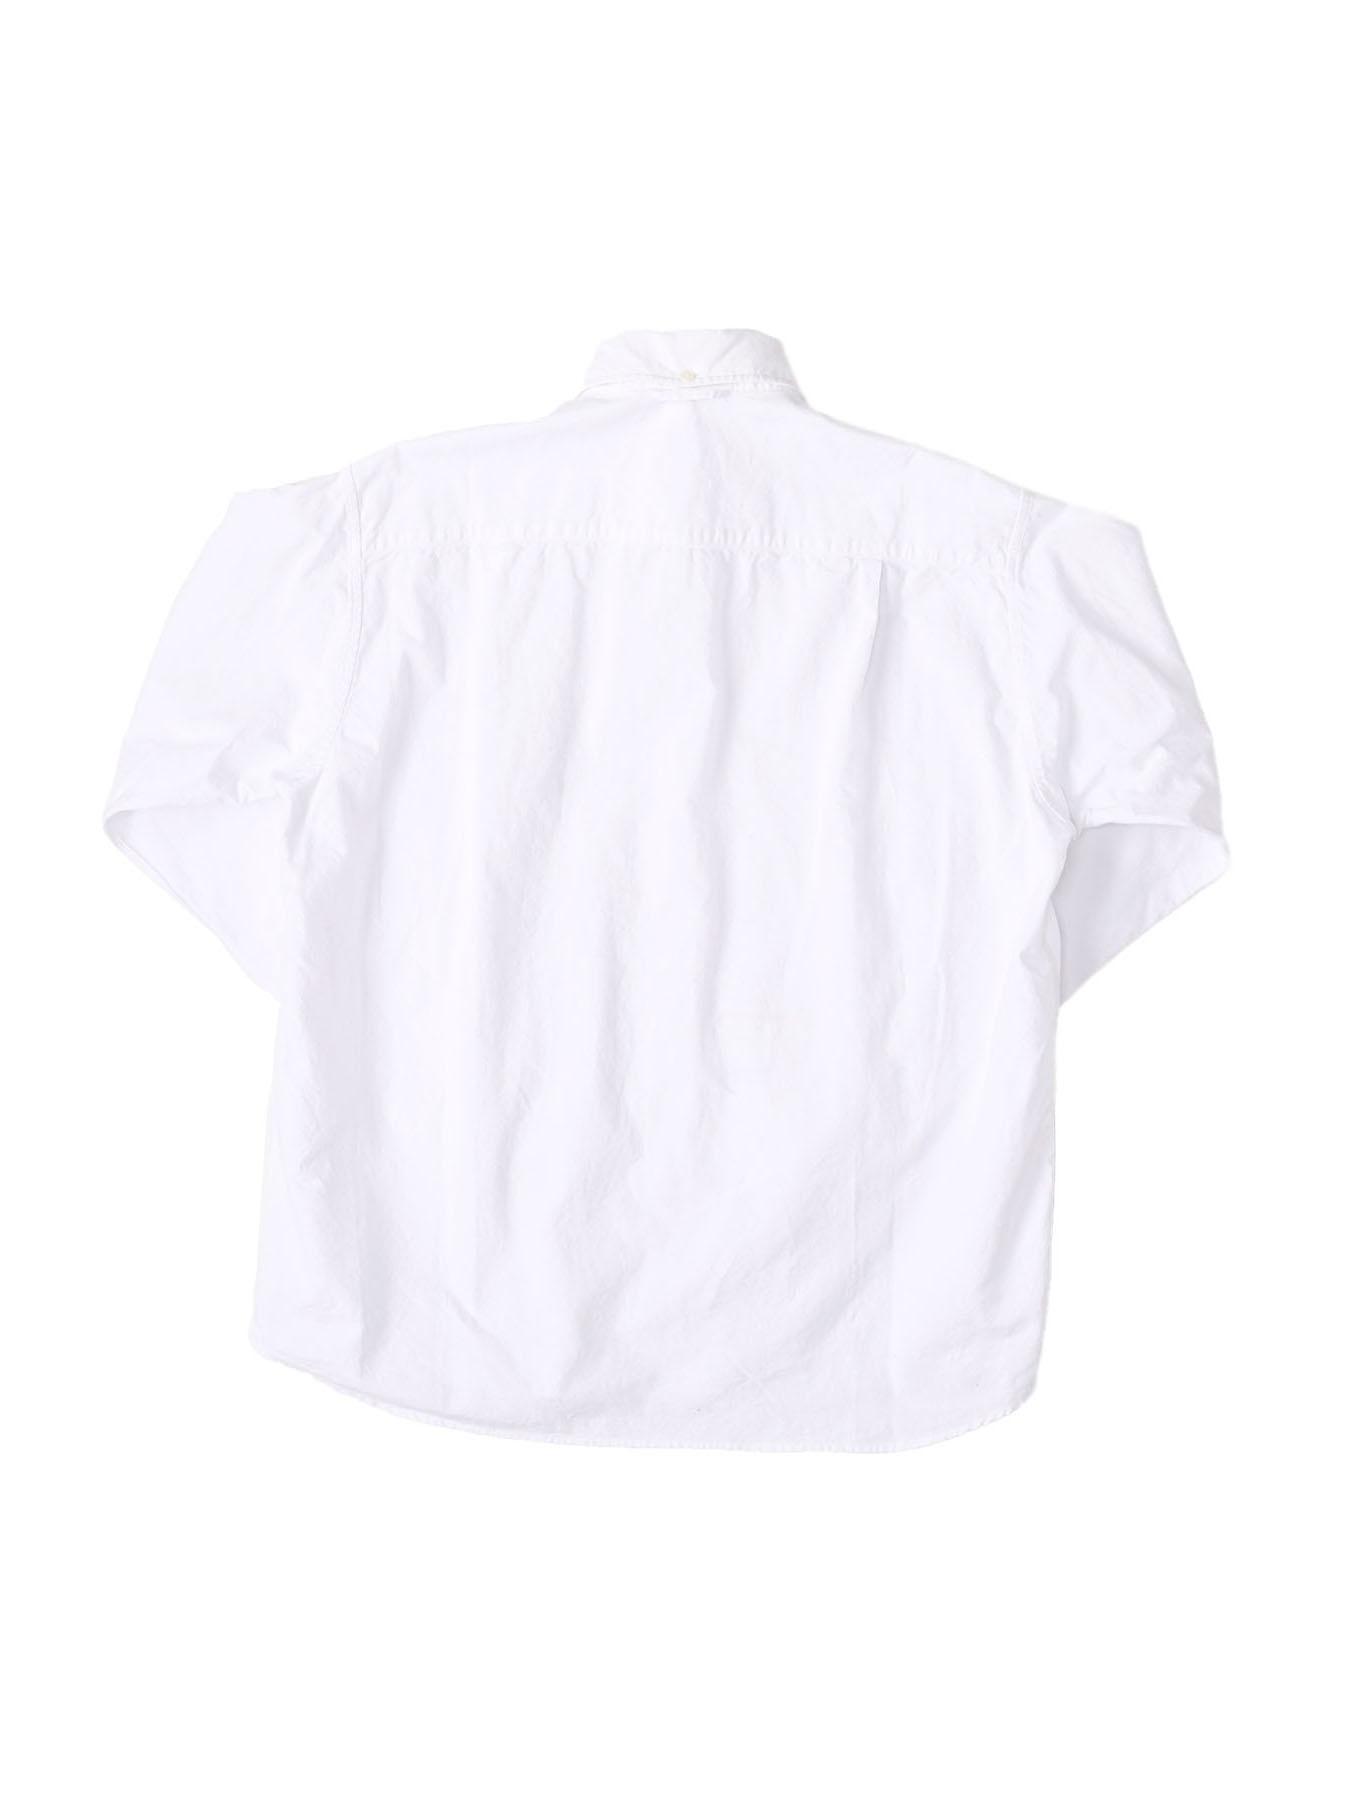 Indian Okome-hira 908 Ocean Button Down Shirt (0321)-11